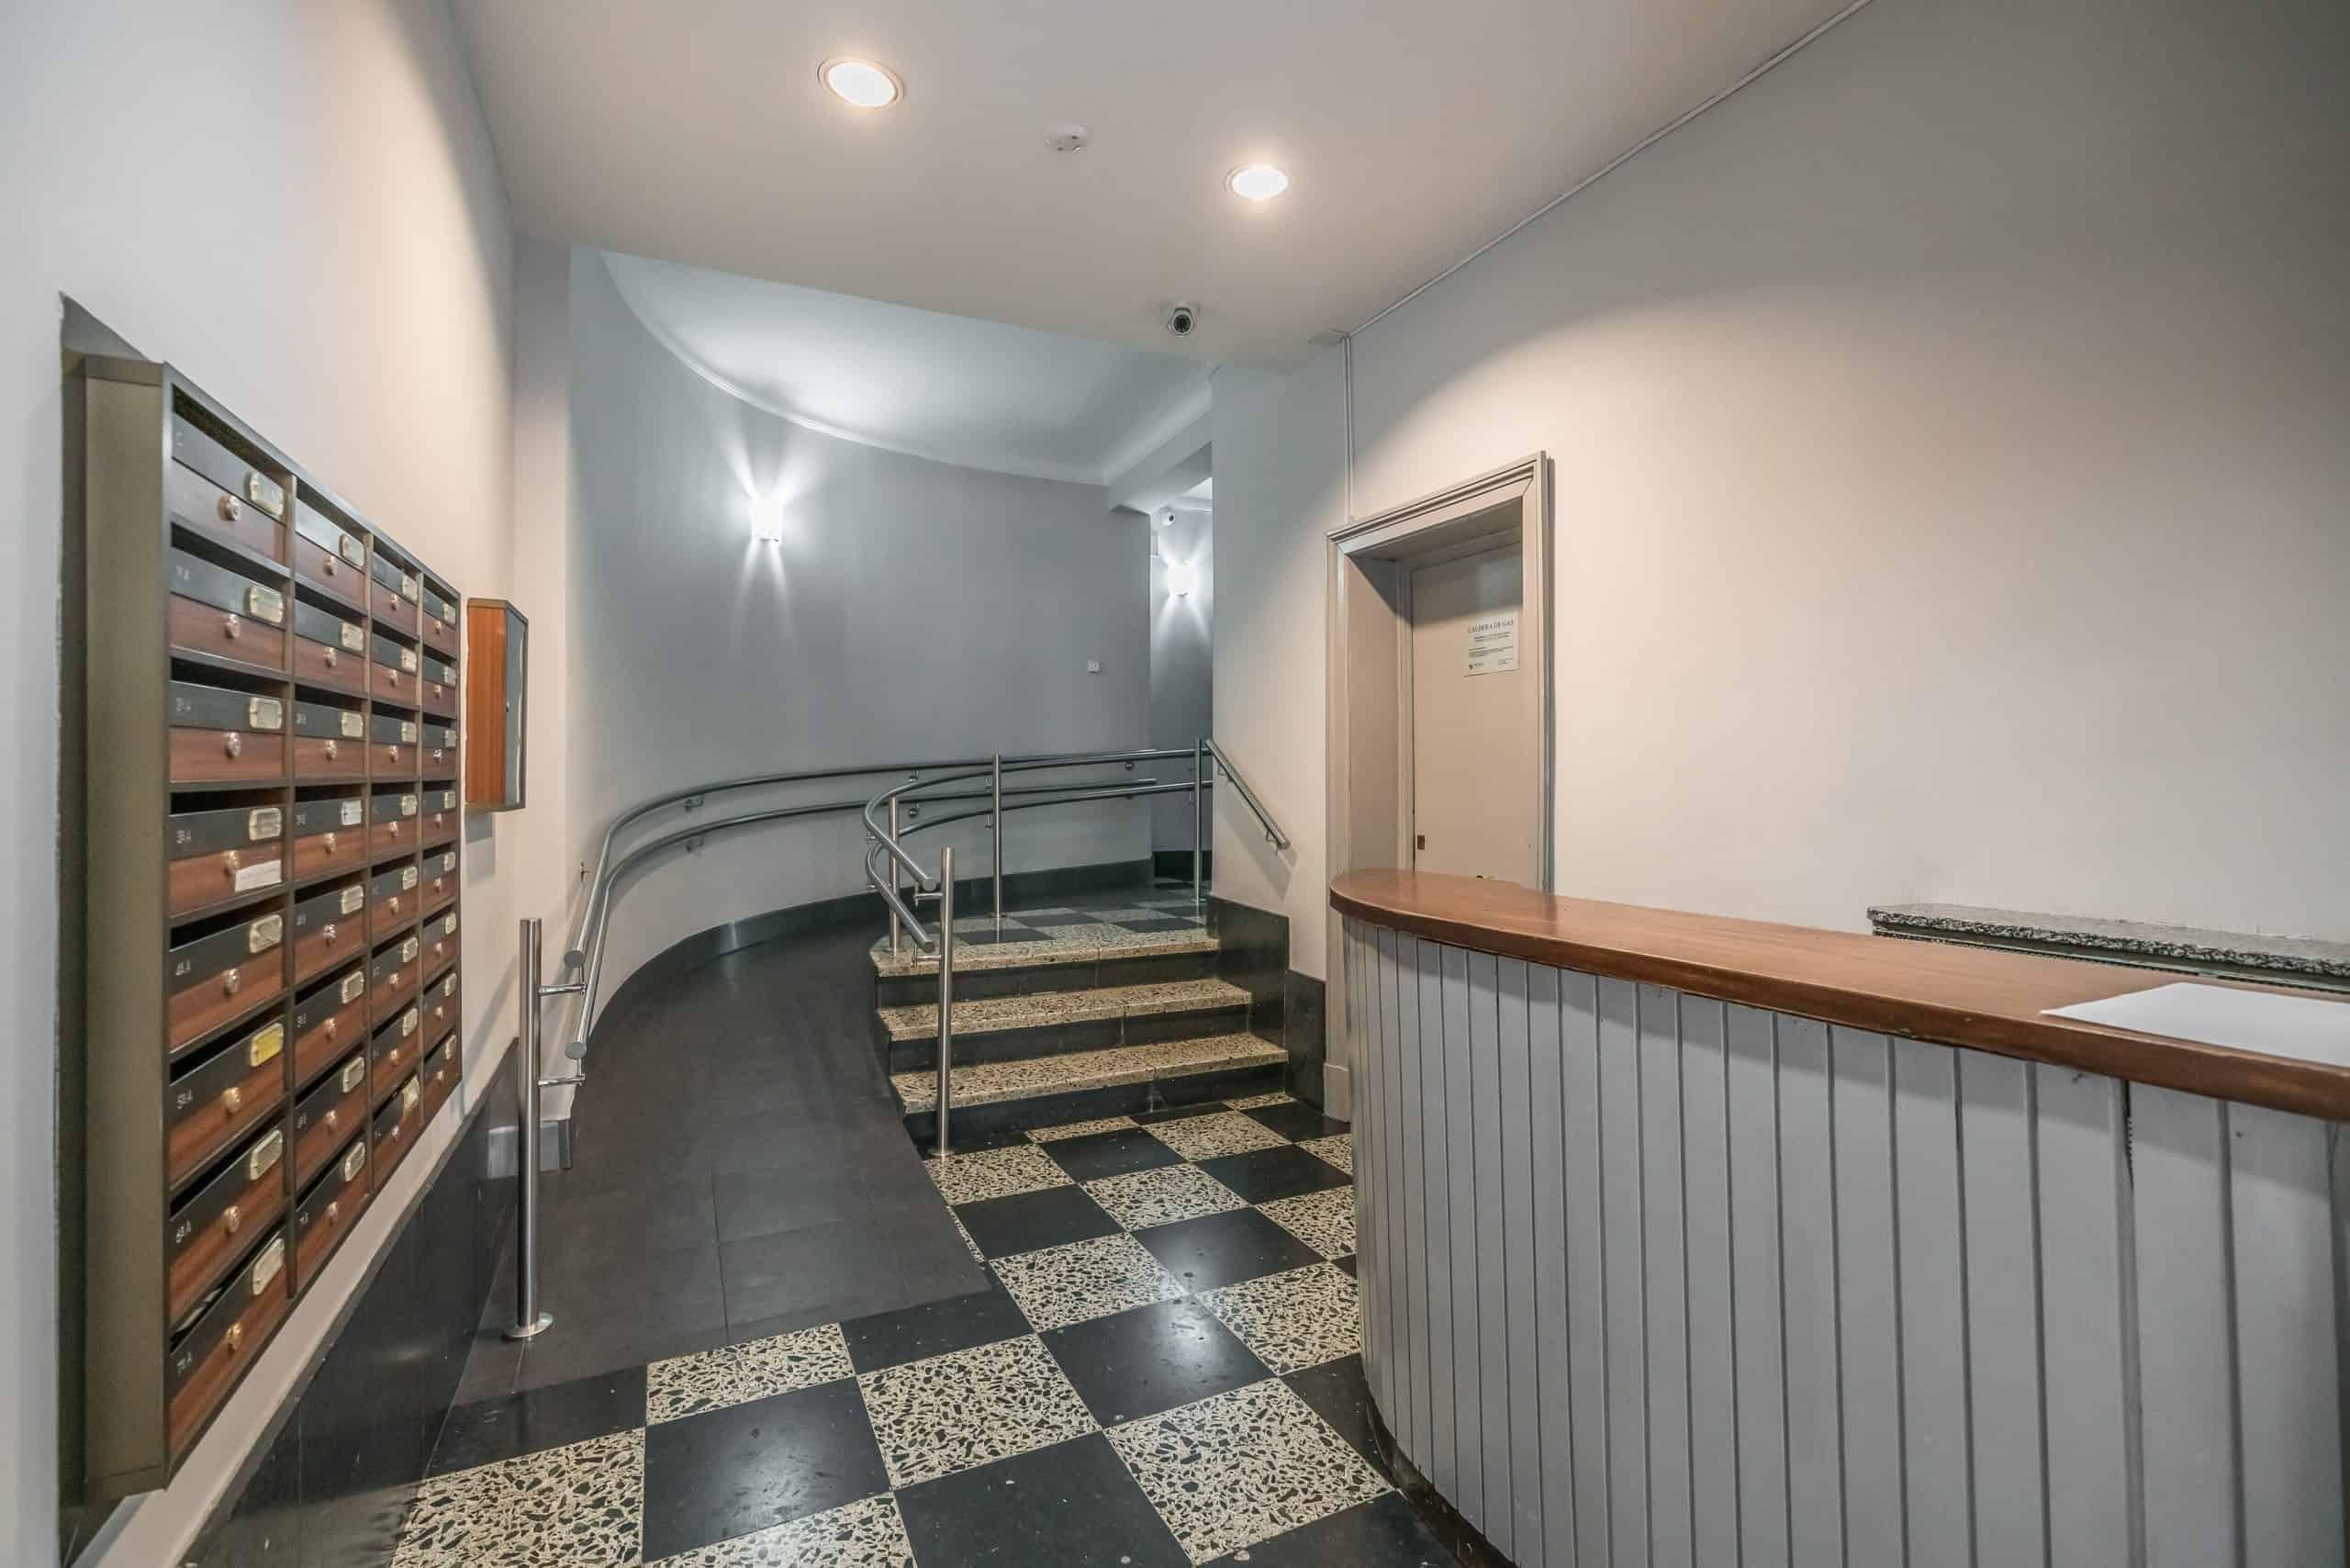 Agencia Inmobiliaria de Madrid-FUTUROCASA-calle Embajadores-Chopera-Arganzuela8 ZONAS COMUNES (3)